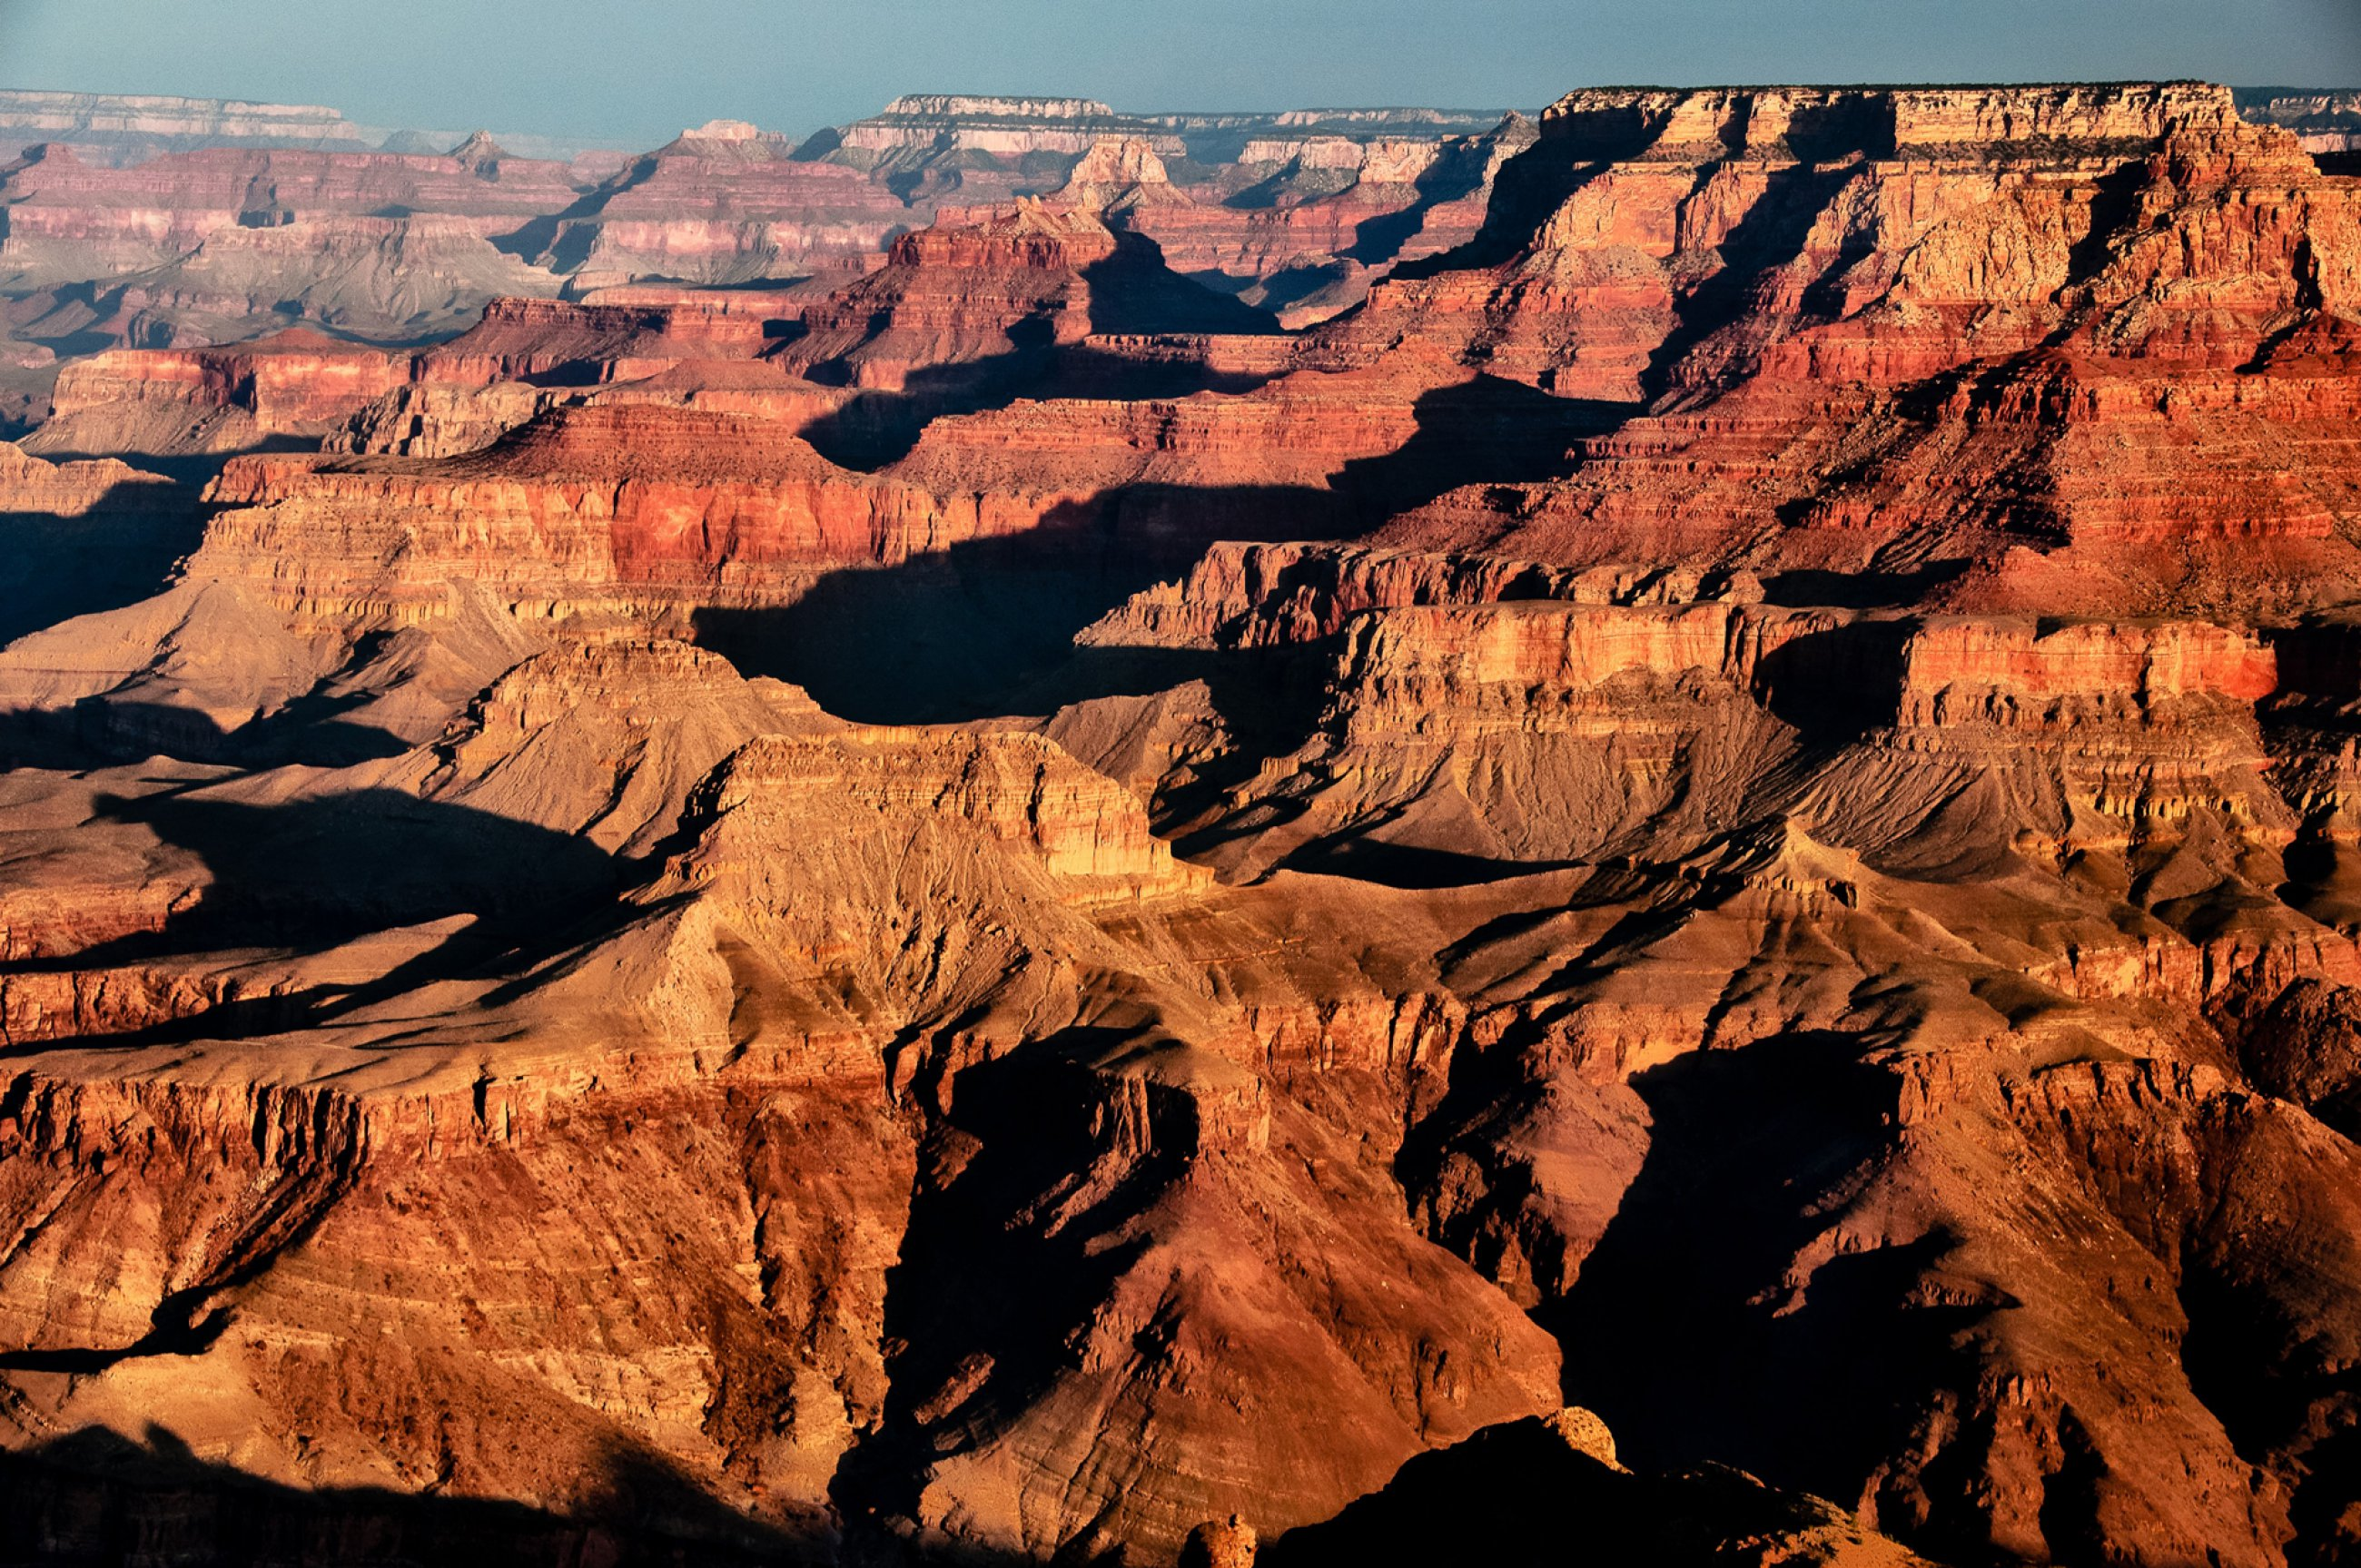 https://bubo.sk/uploads/galleries/4995/grand-canyon-shutterstock-236202247-5-.jpg